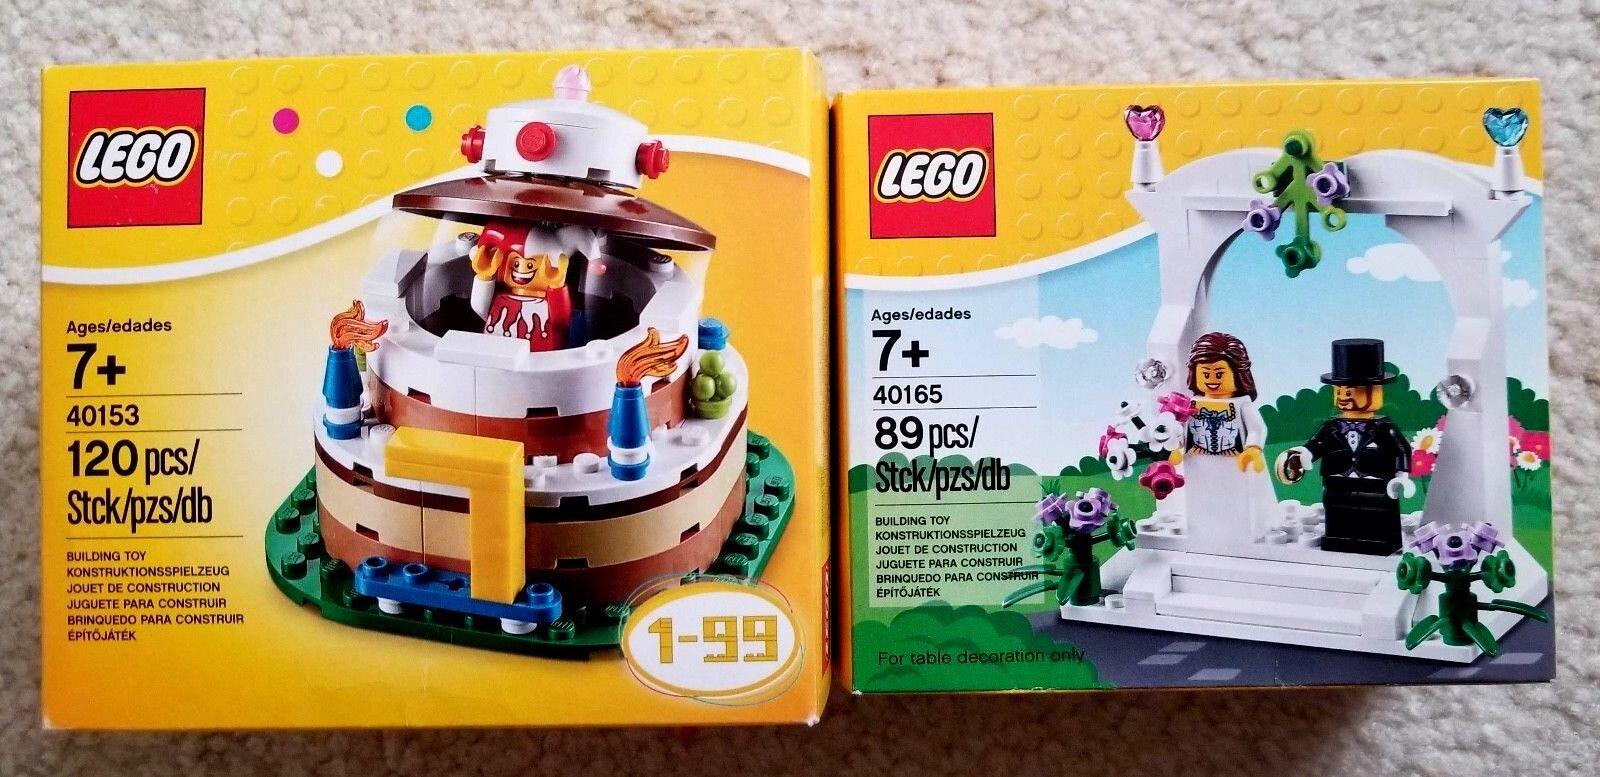 NEW LEGO Birthday Cake Table 40153 Wedding Bride Groom 40165 Set Best Gift 01e939